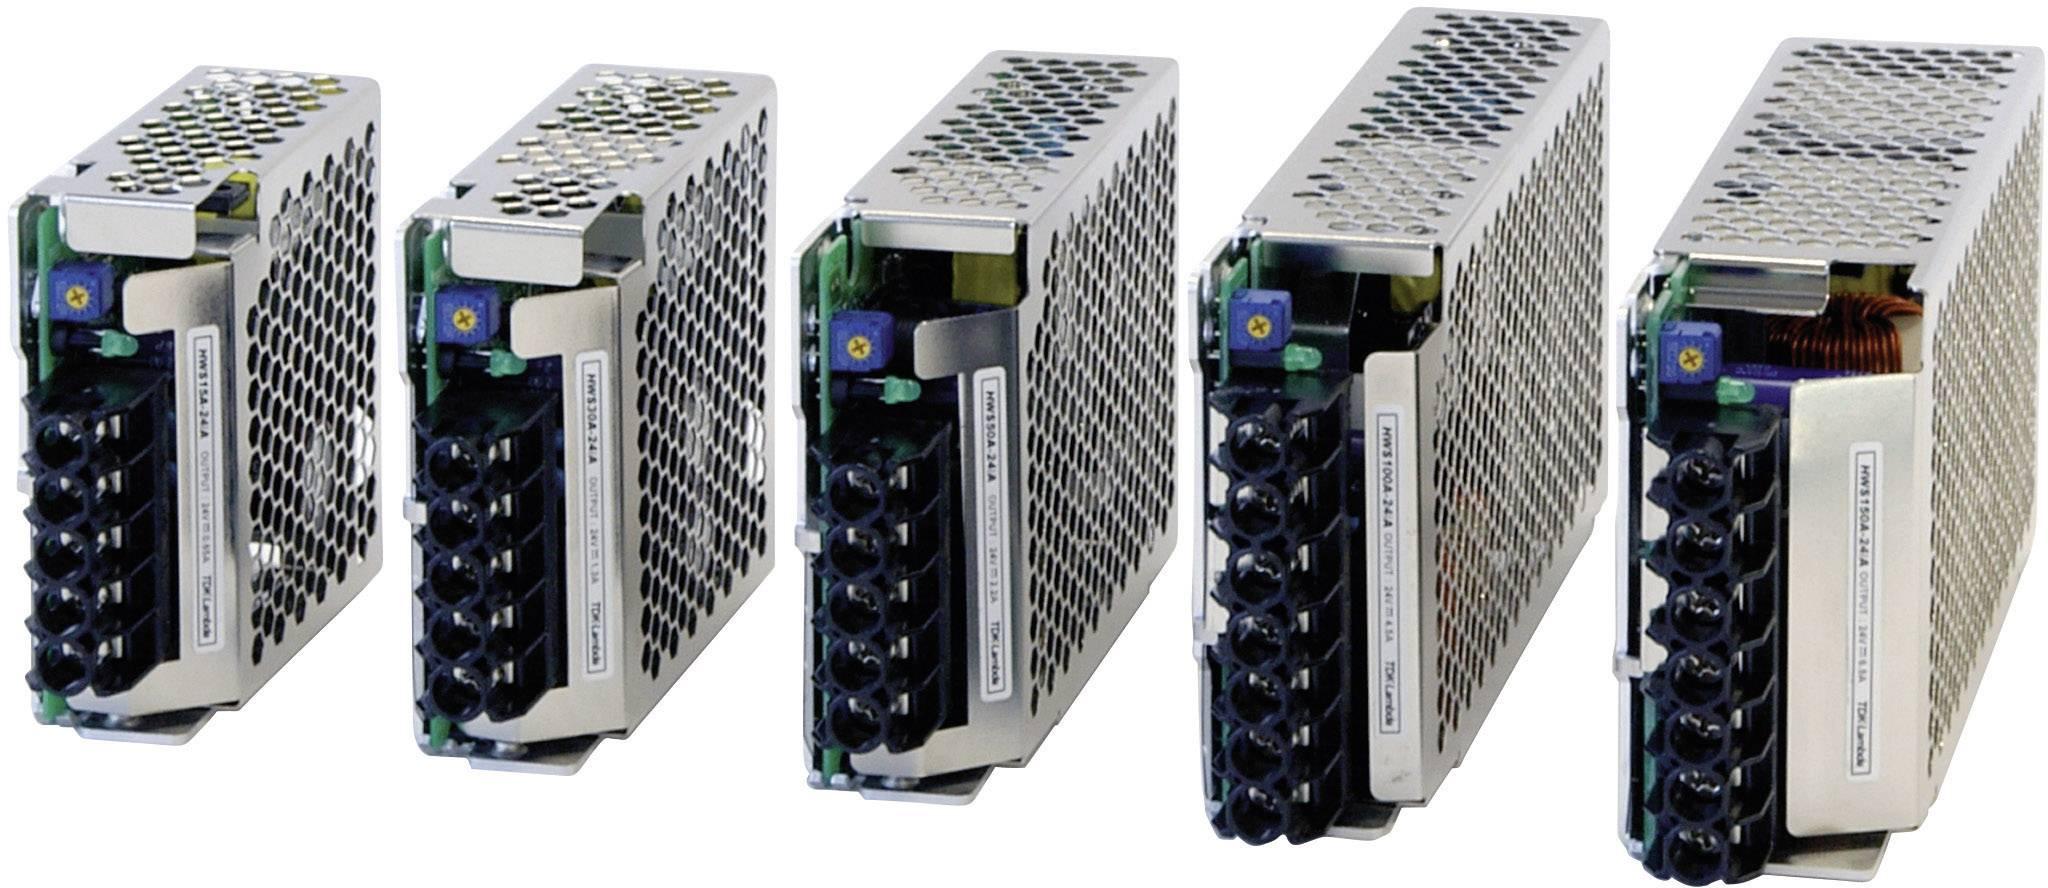 Zabudovateľný napájací zdroj TDK-Lambda HWS-150-24/A, 24 V, 156 W